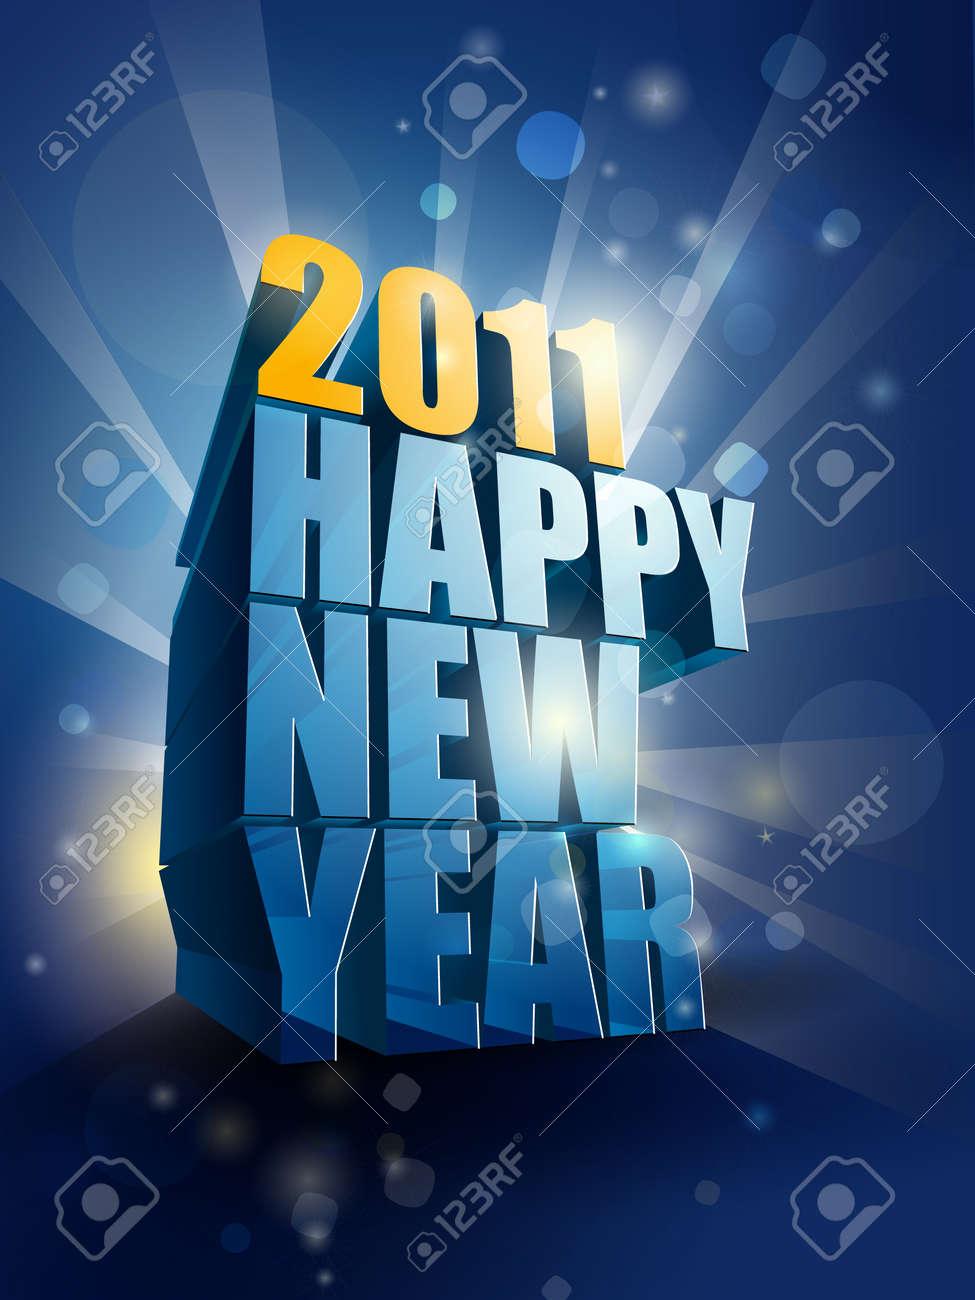 2011 Happy New Year card illustration Stock Vector - 8333666